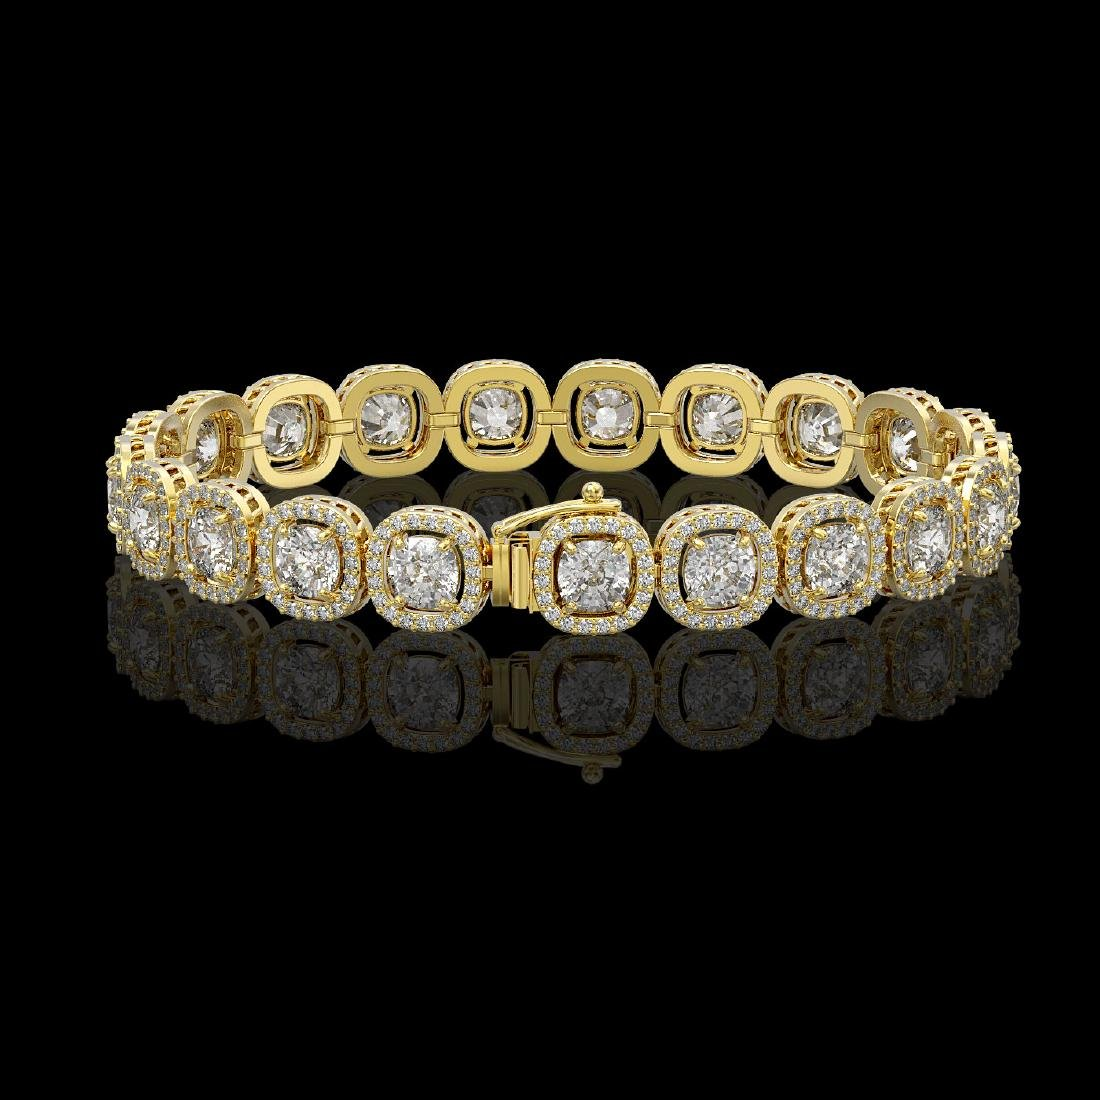 14.41 CTW Cushion Diamond Designer Bracelet 18K Yellow - 2